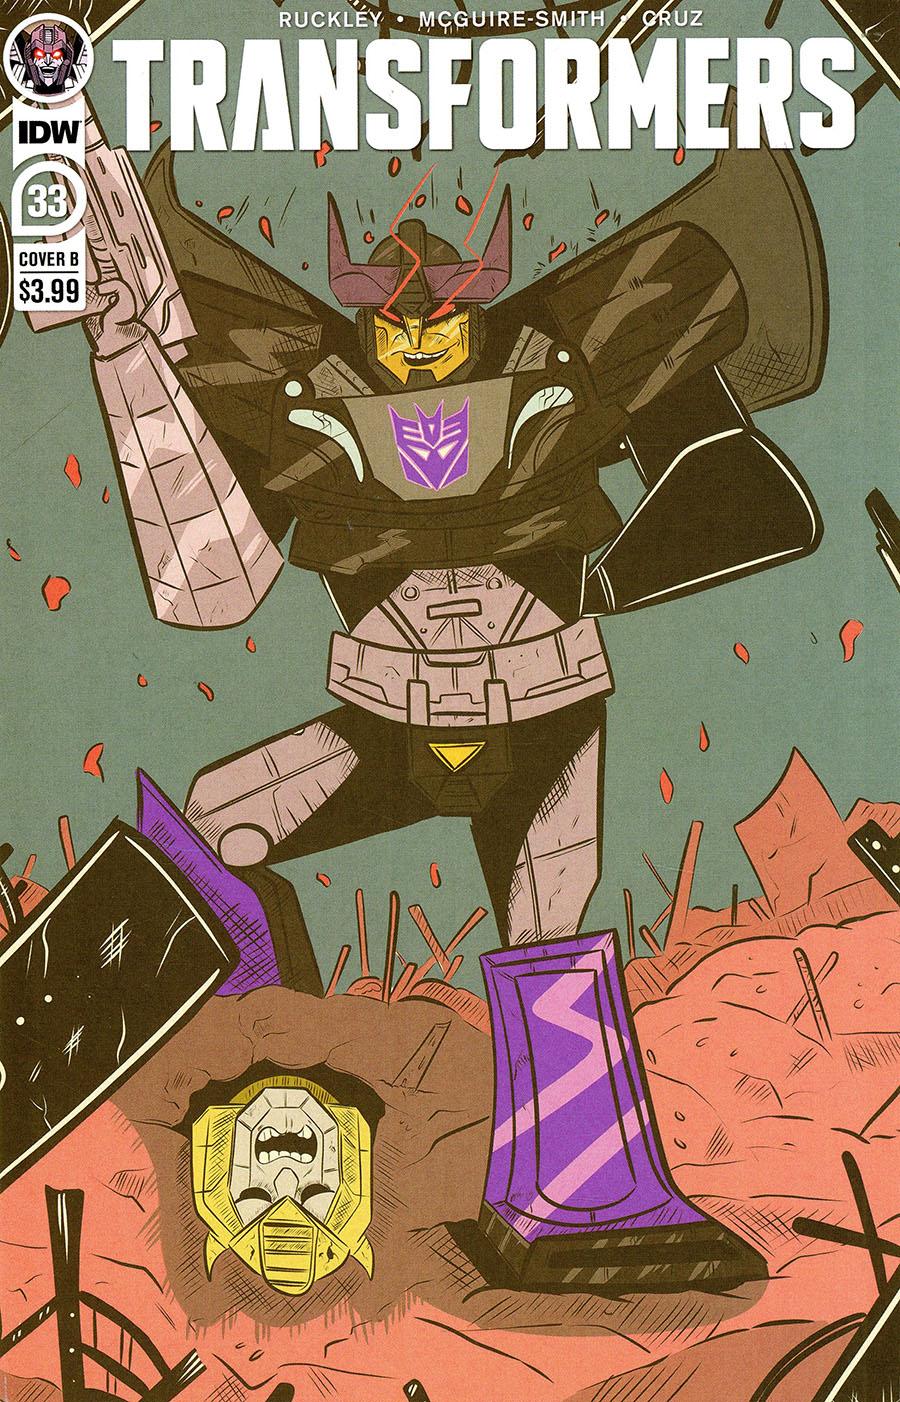 Transformers Vol 4 #33 Cover B Variant Lane Lloyd Cover